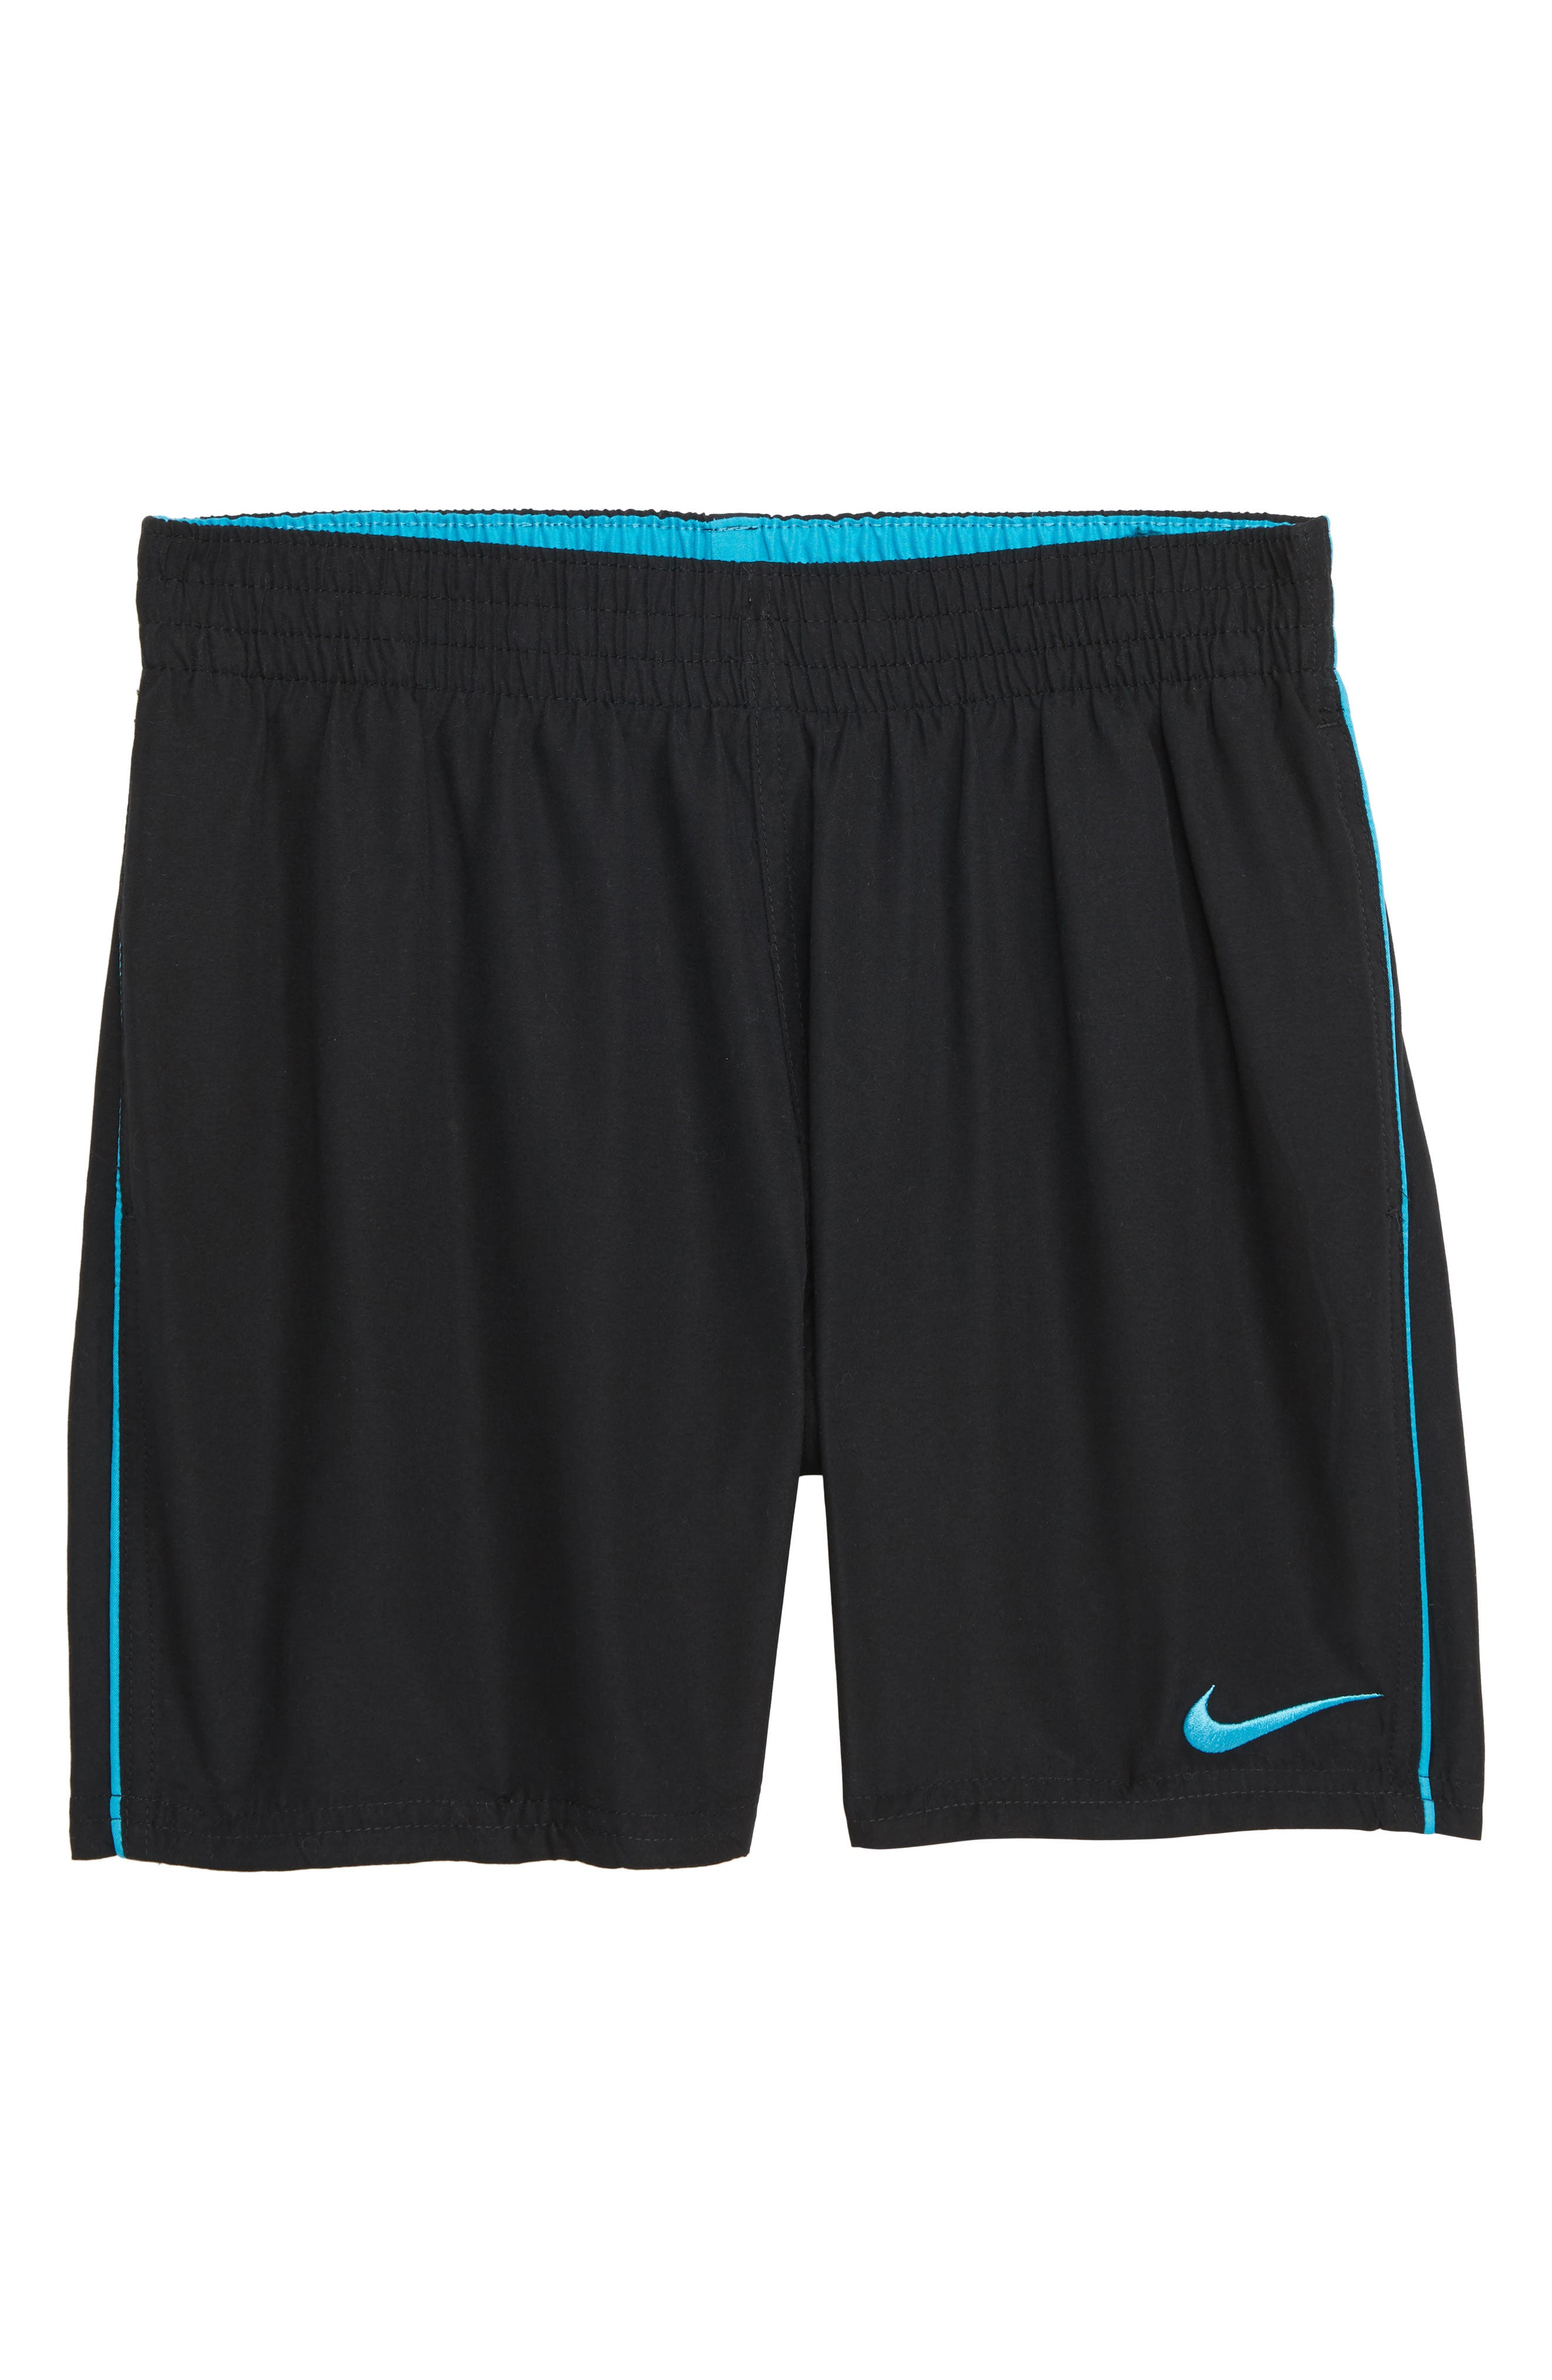 Lap Volley Swim Trunks, Main, color, BLACK